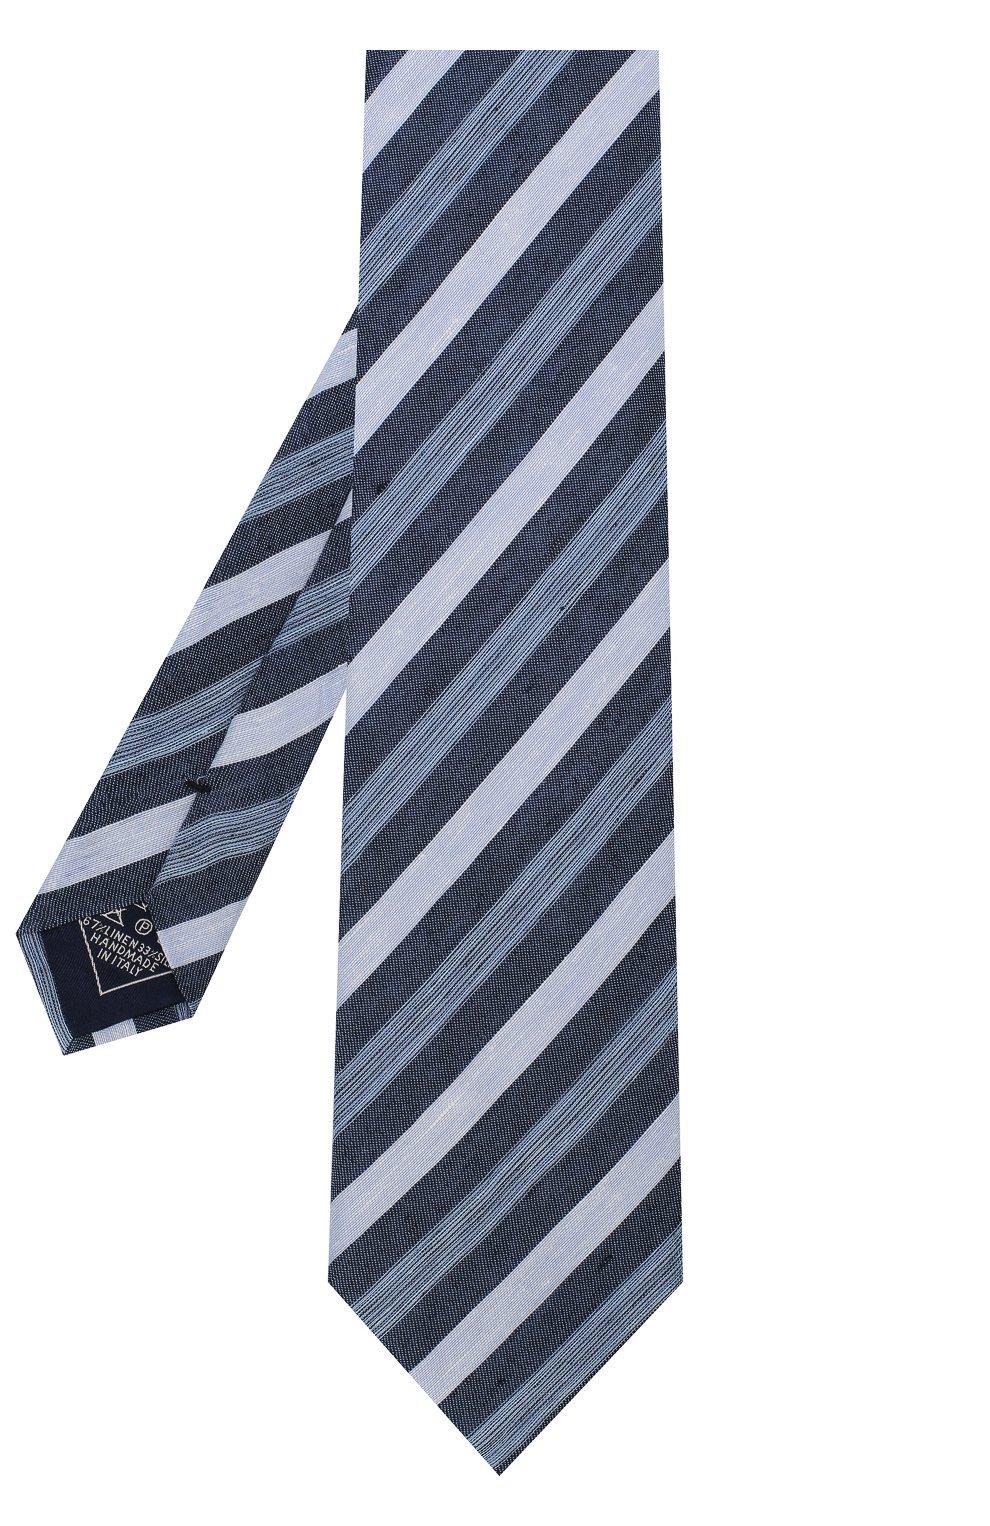 Мужской галстук из смеси льна и шелка BRIONI голубого цвета, арт. 063I00/P7461   Фото 2